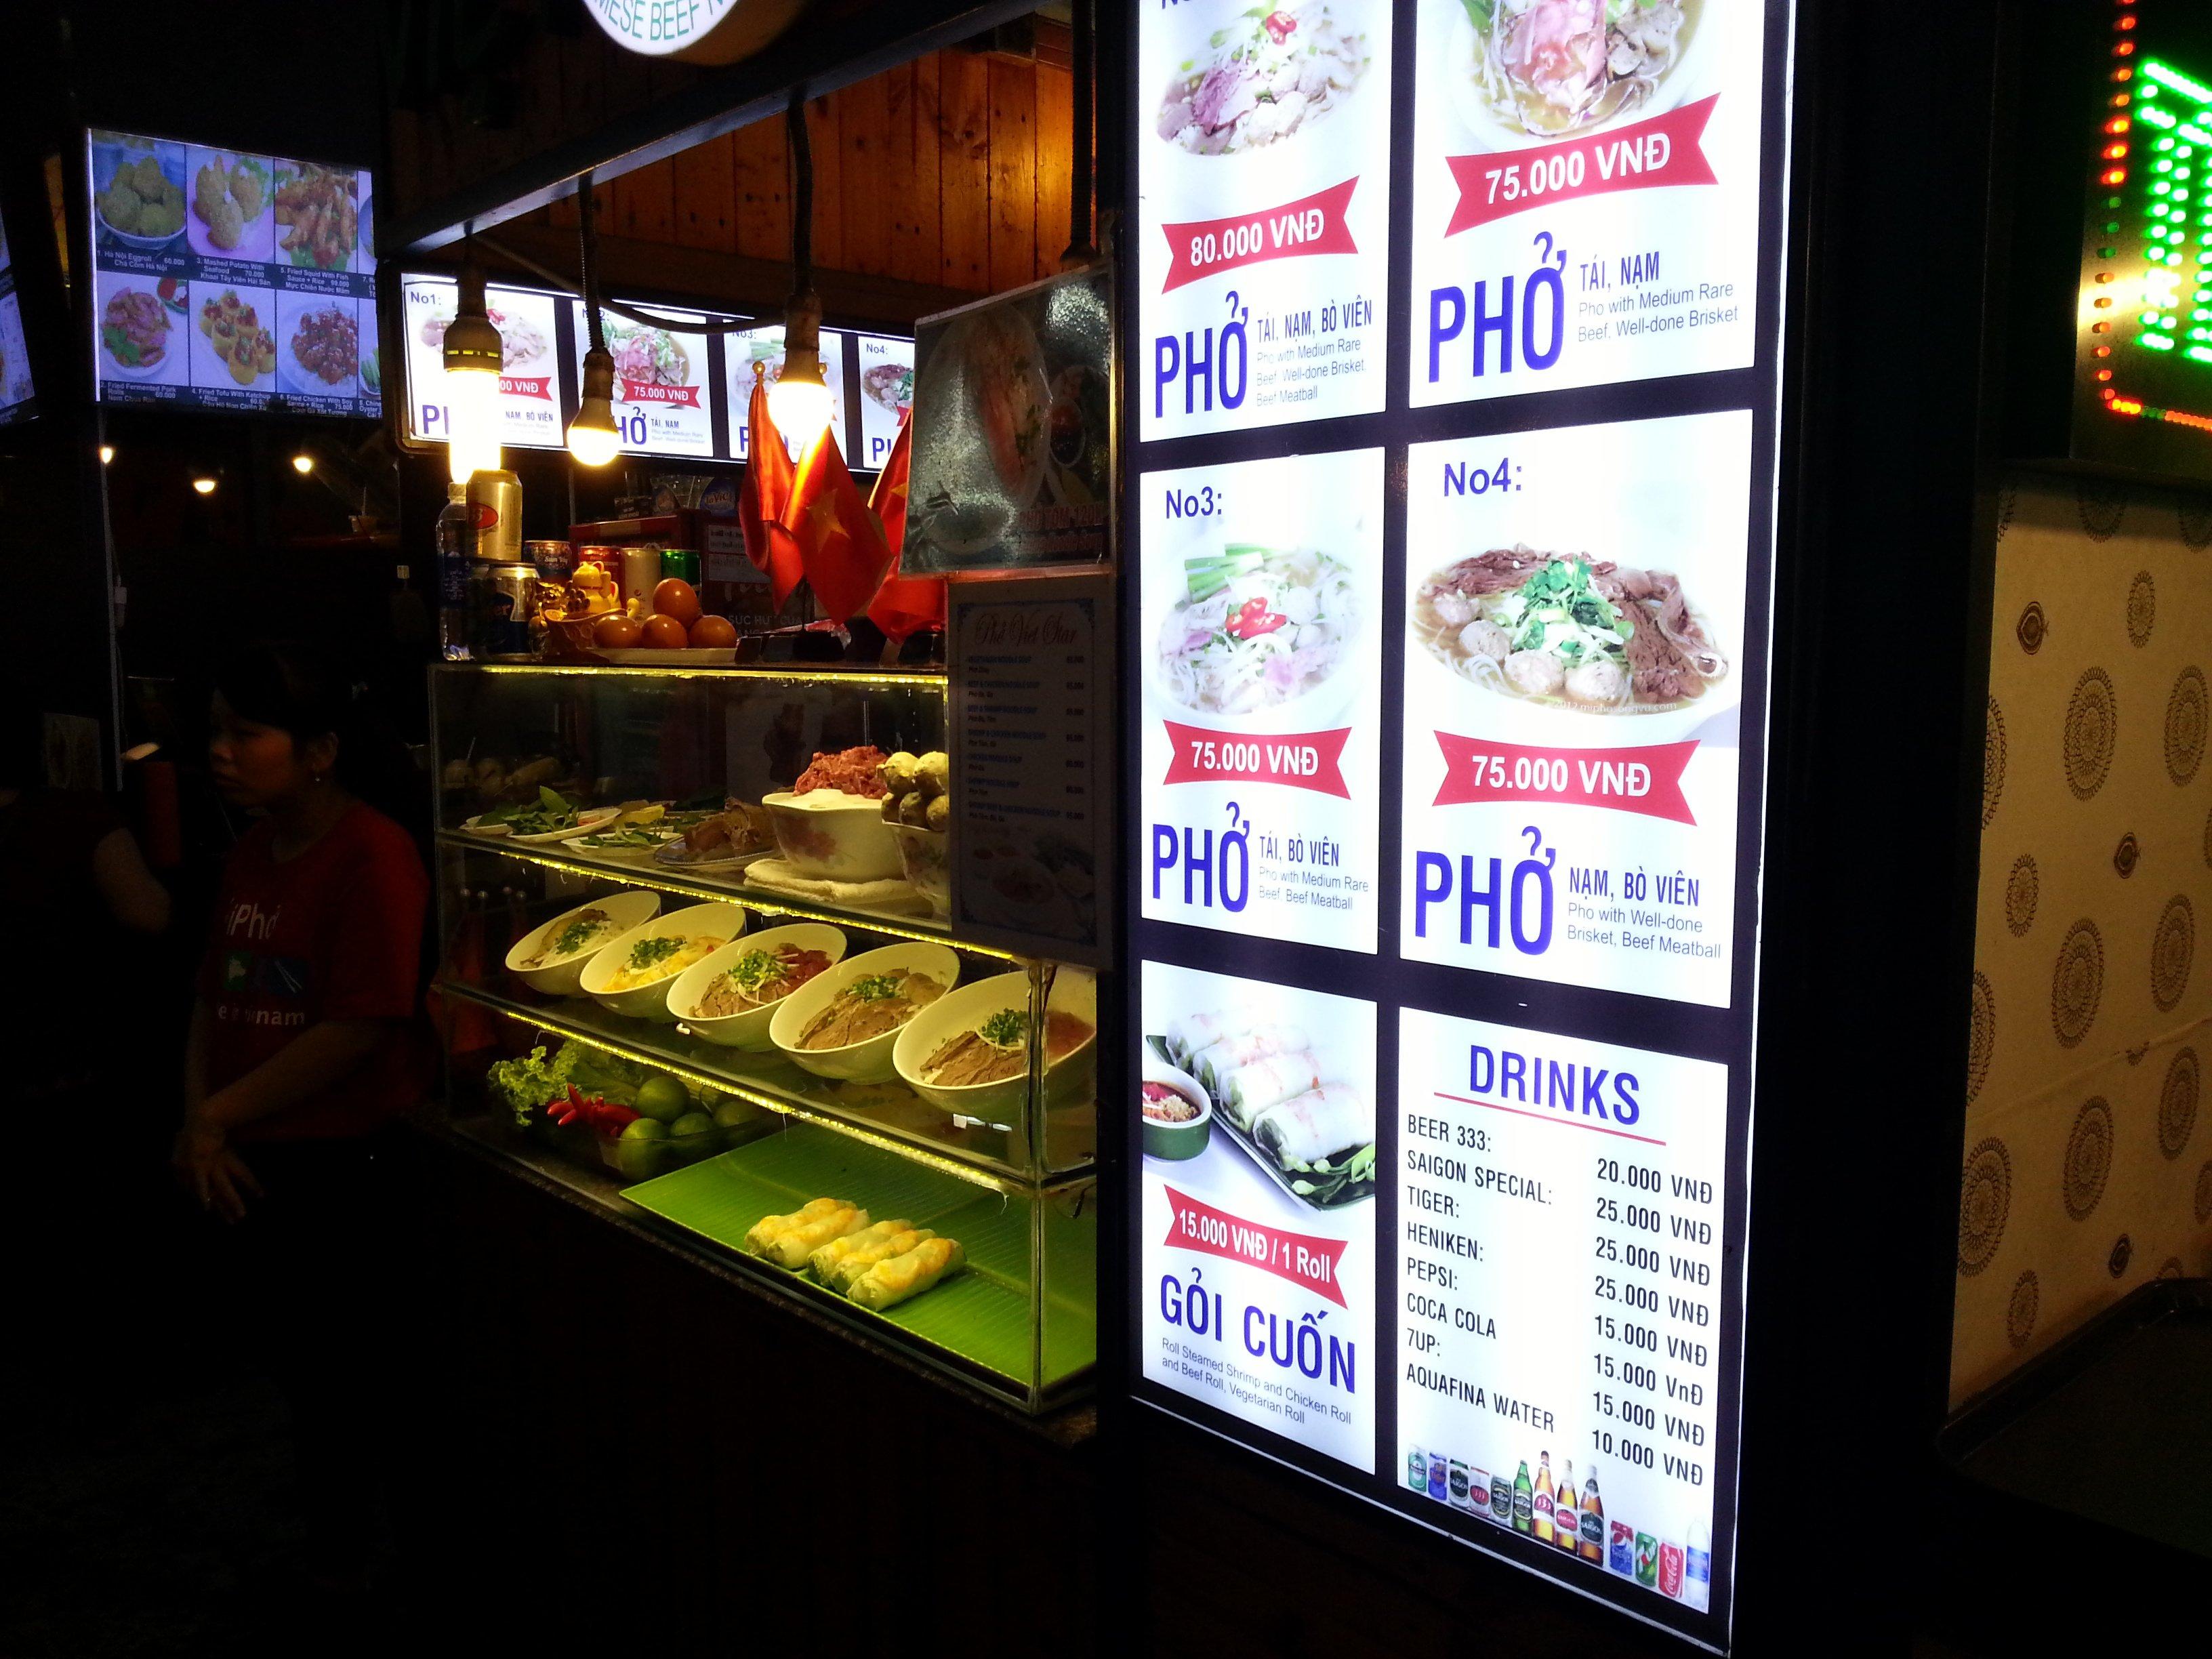 Pho stall at Ben Thanh Street Food Market